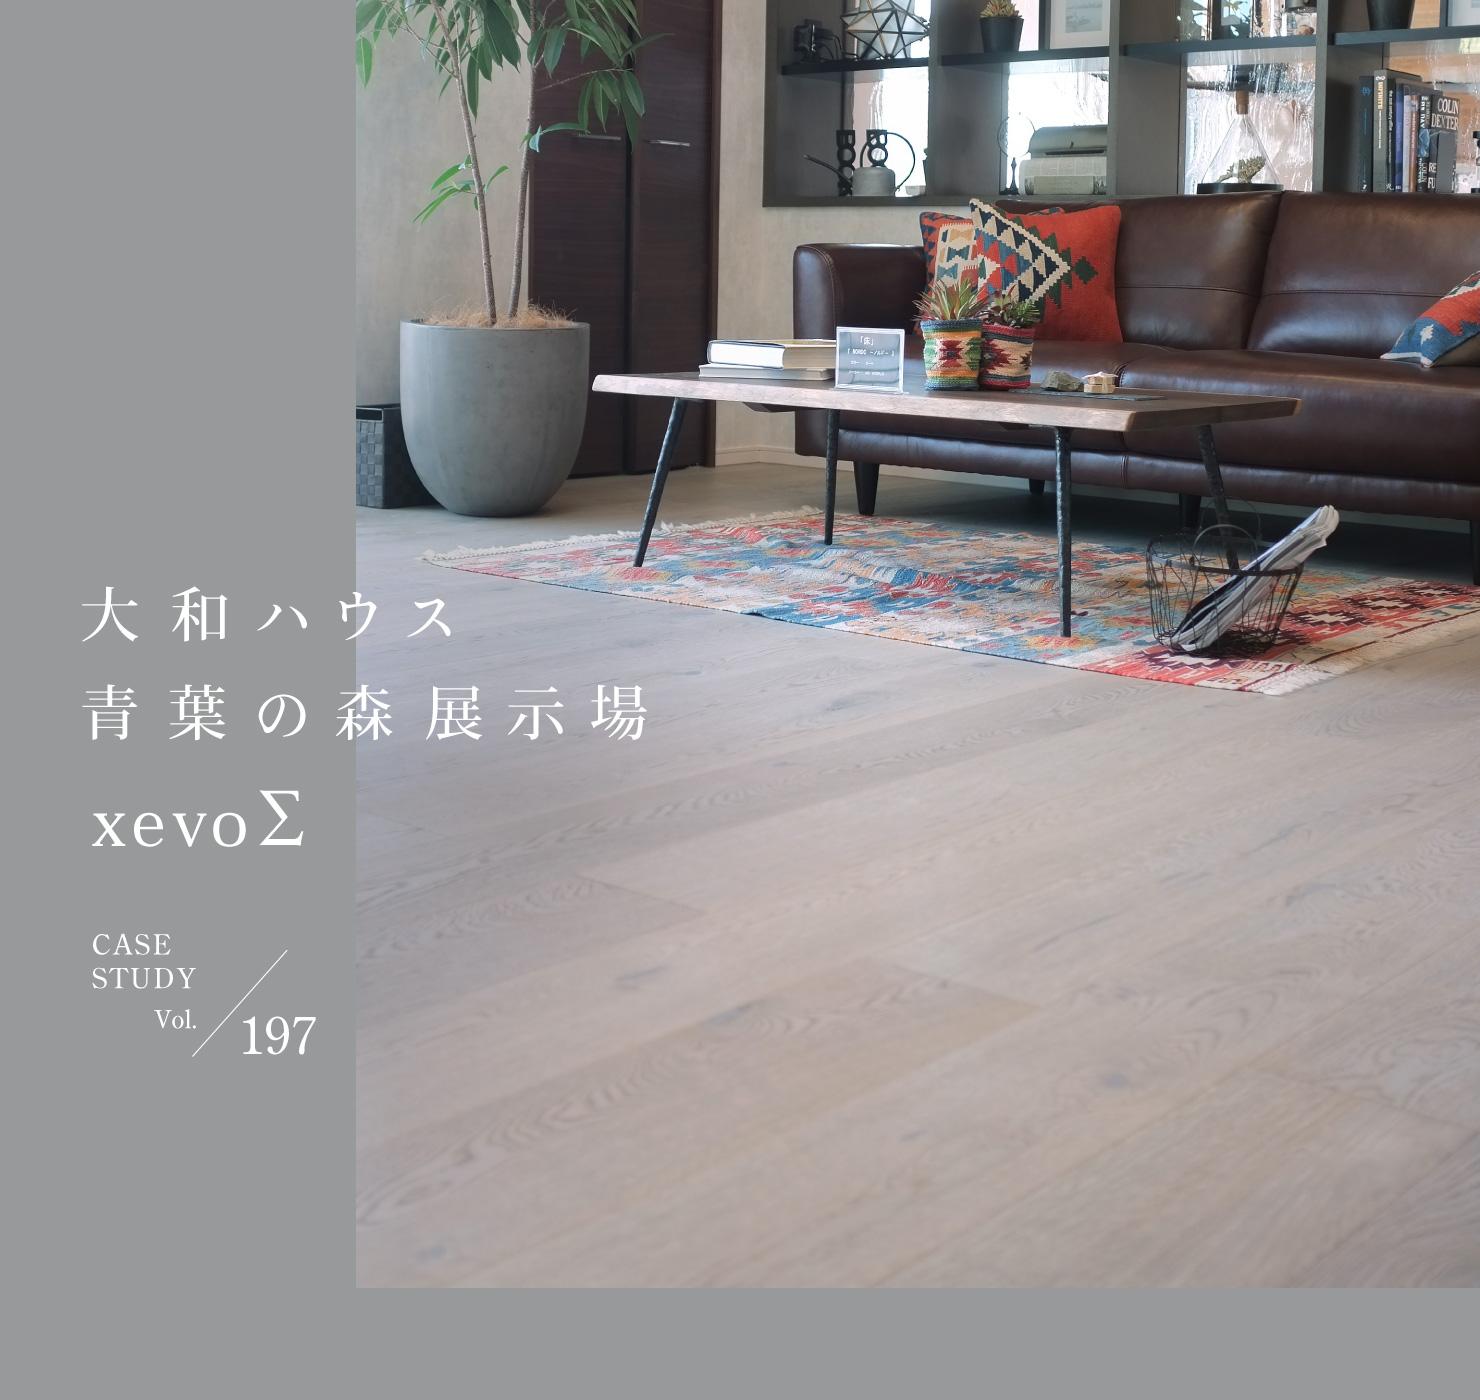 CASE STUDY Vol.197 大和ハウス 青葉の森展示場 xevoΣ